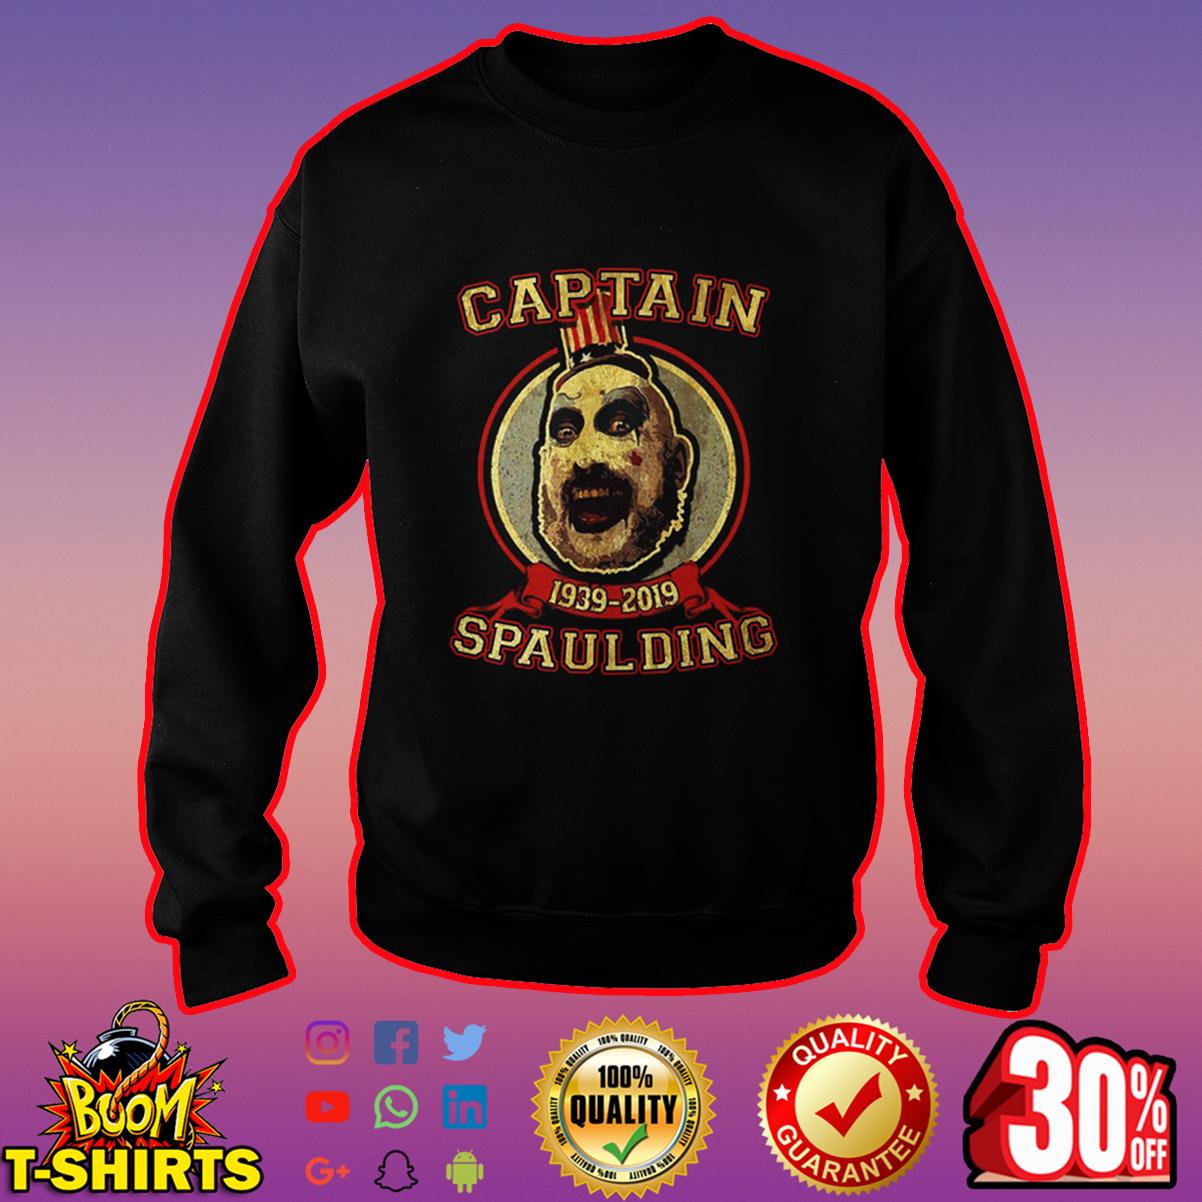 Captain Spaulding 1939-2019 sweatshirt